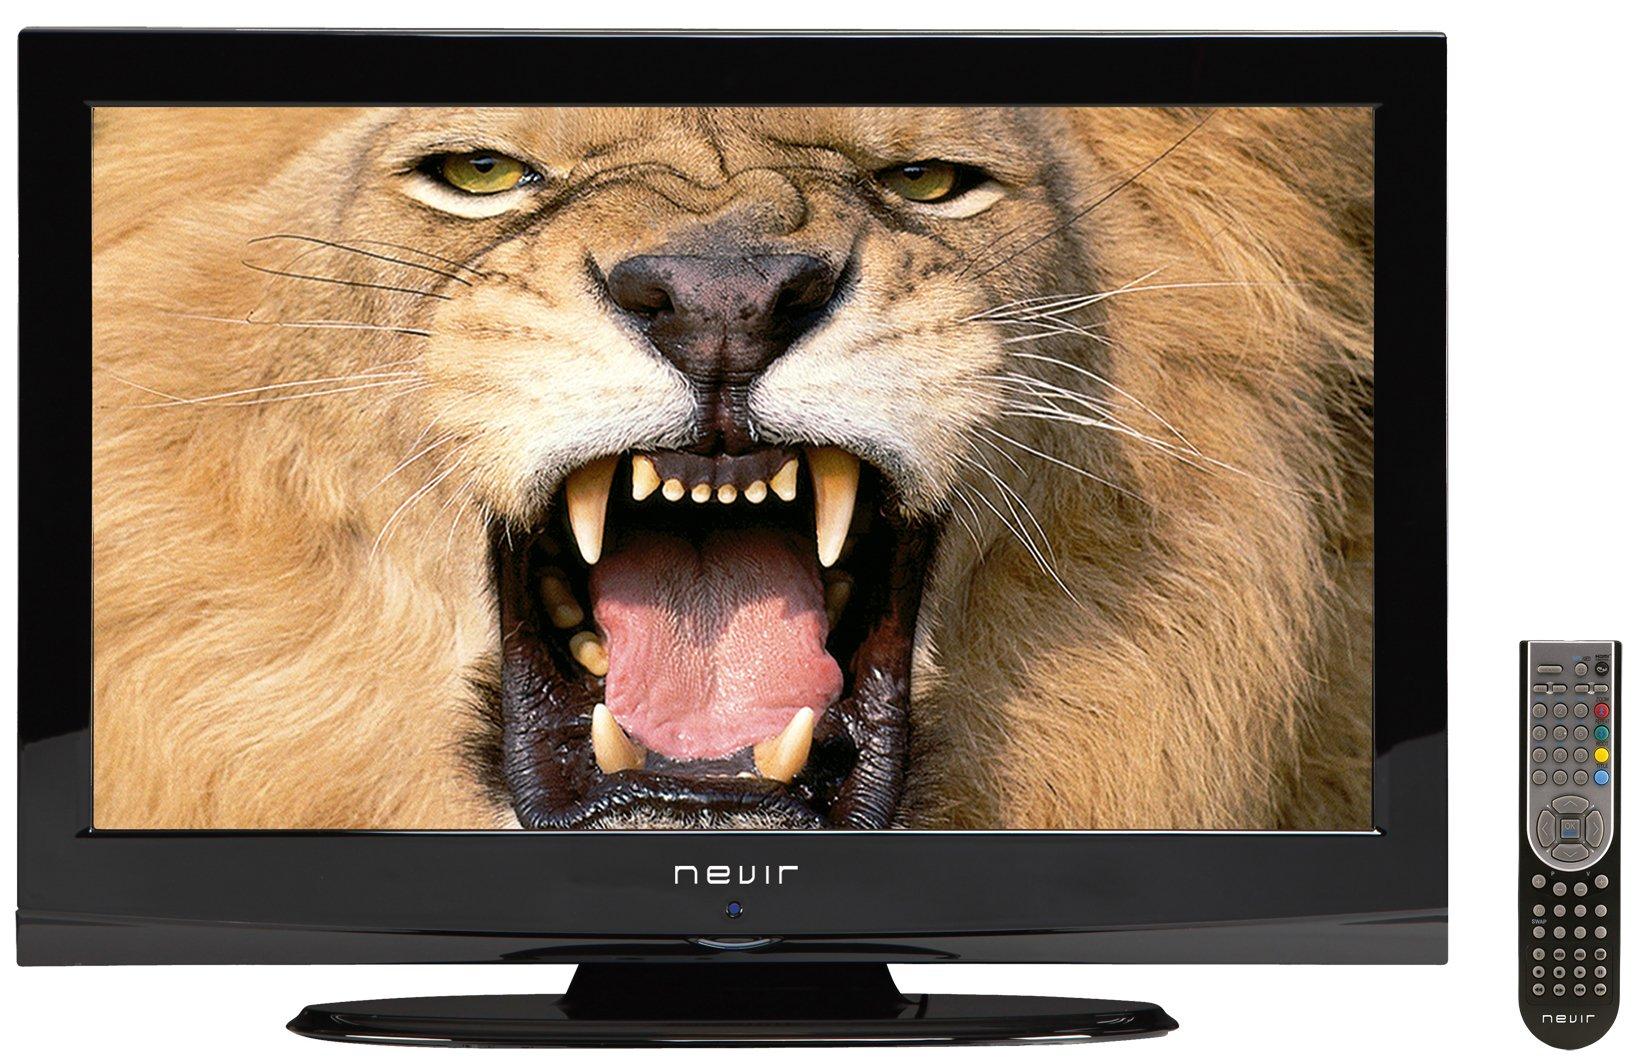 Nevir NVR-7201-26HD-N TV 66 cm (26